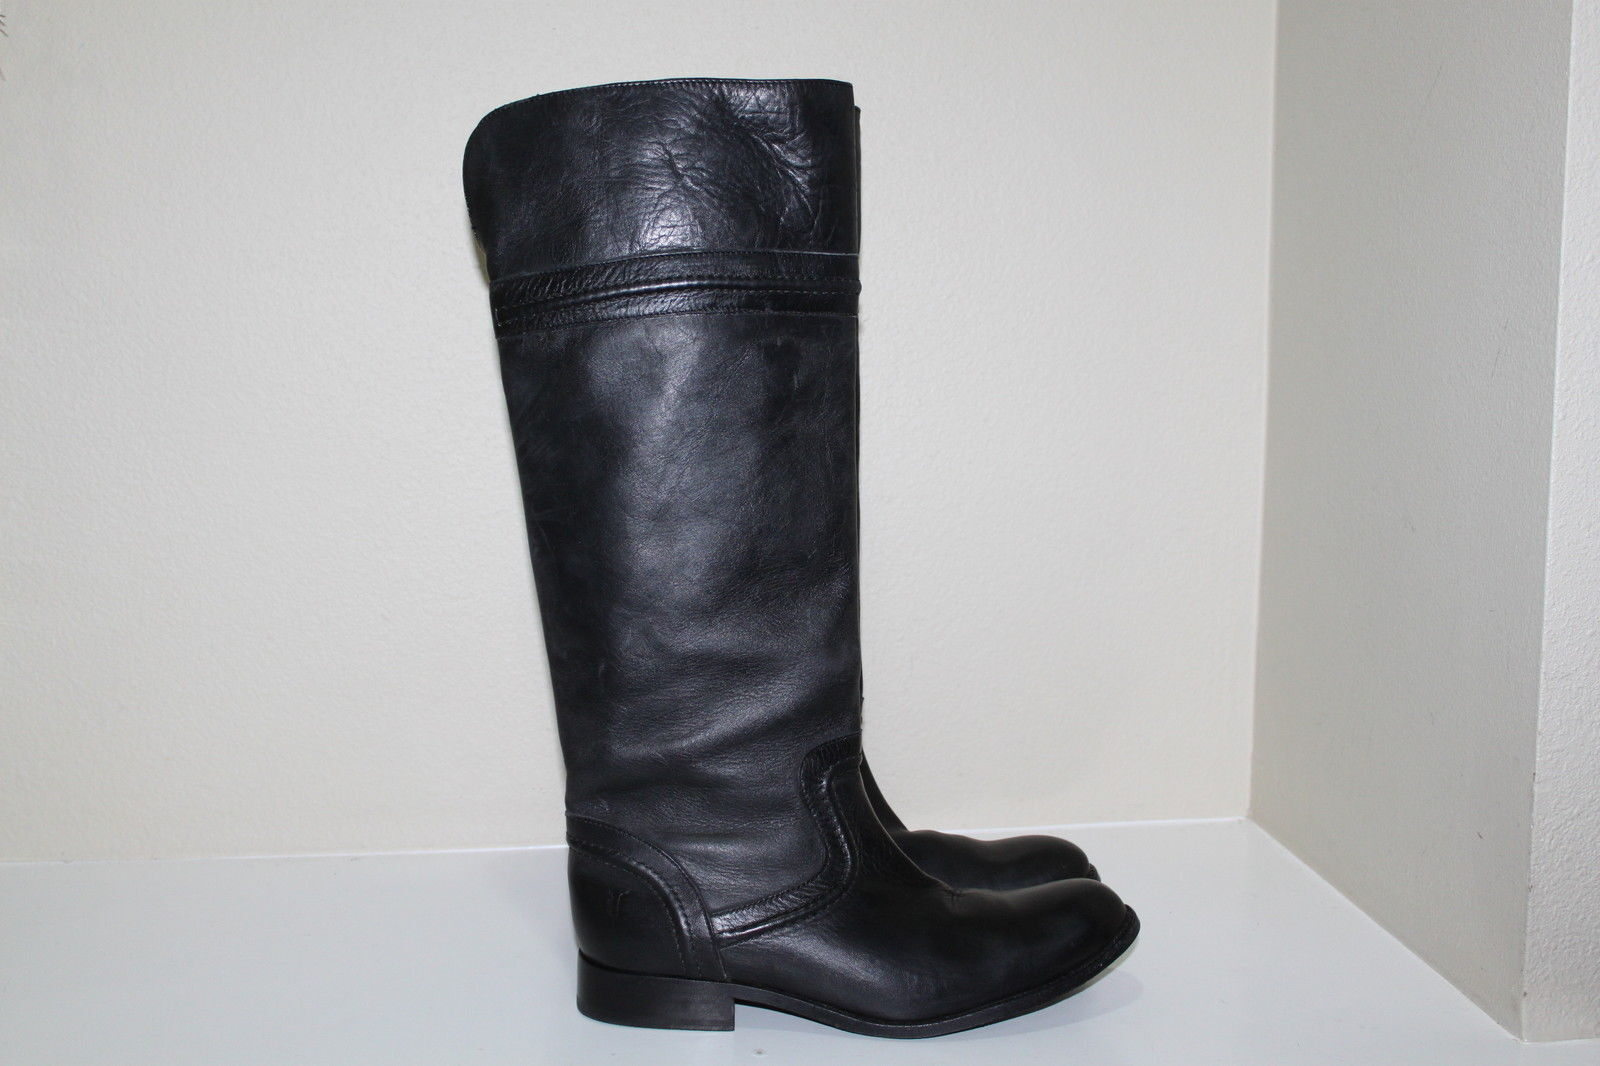 alta qualità Sz 5.5 5.5 5.5 Frye Melissa Trapunto nero Leather Tall Riding stivali Low Heel scarpe  disponibile